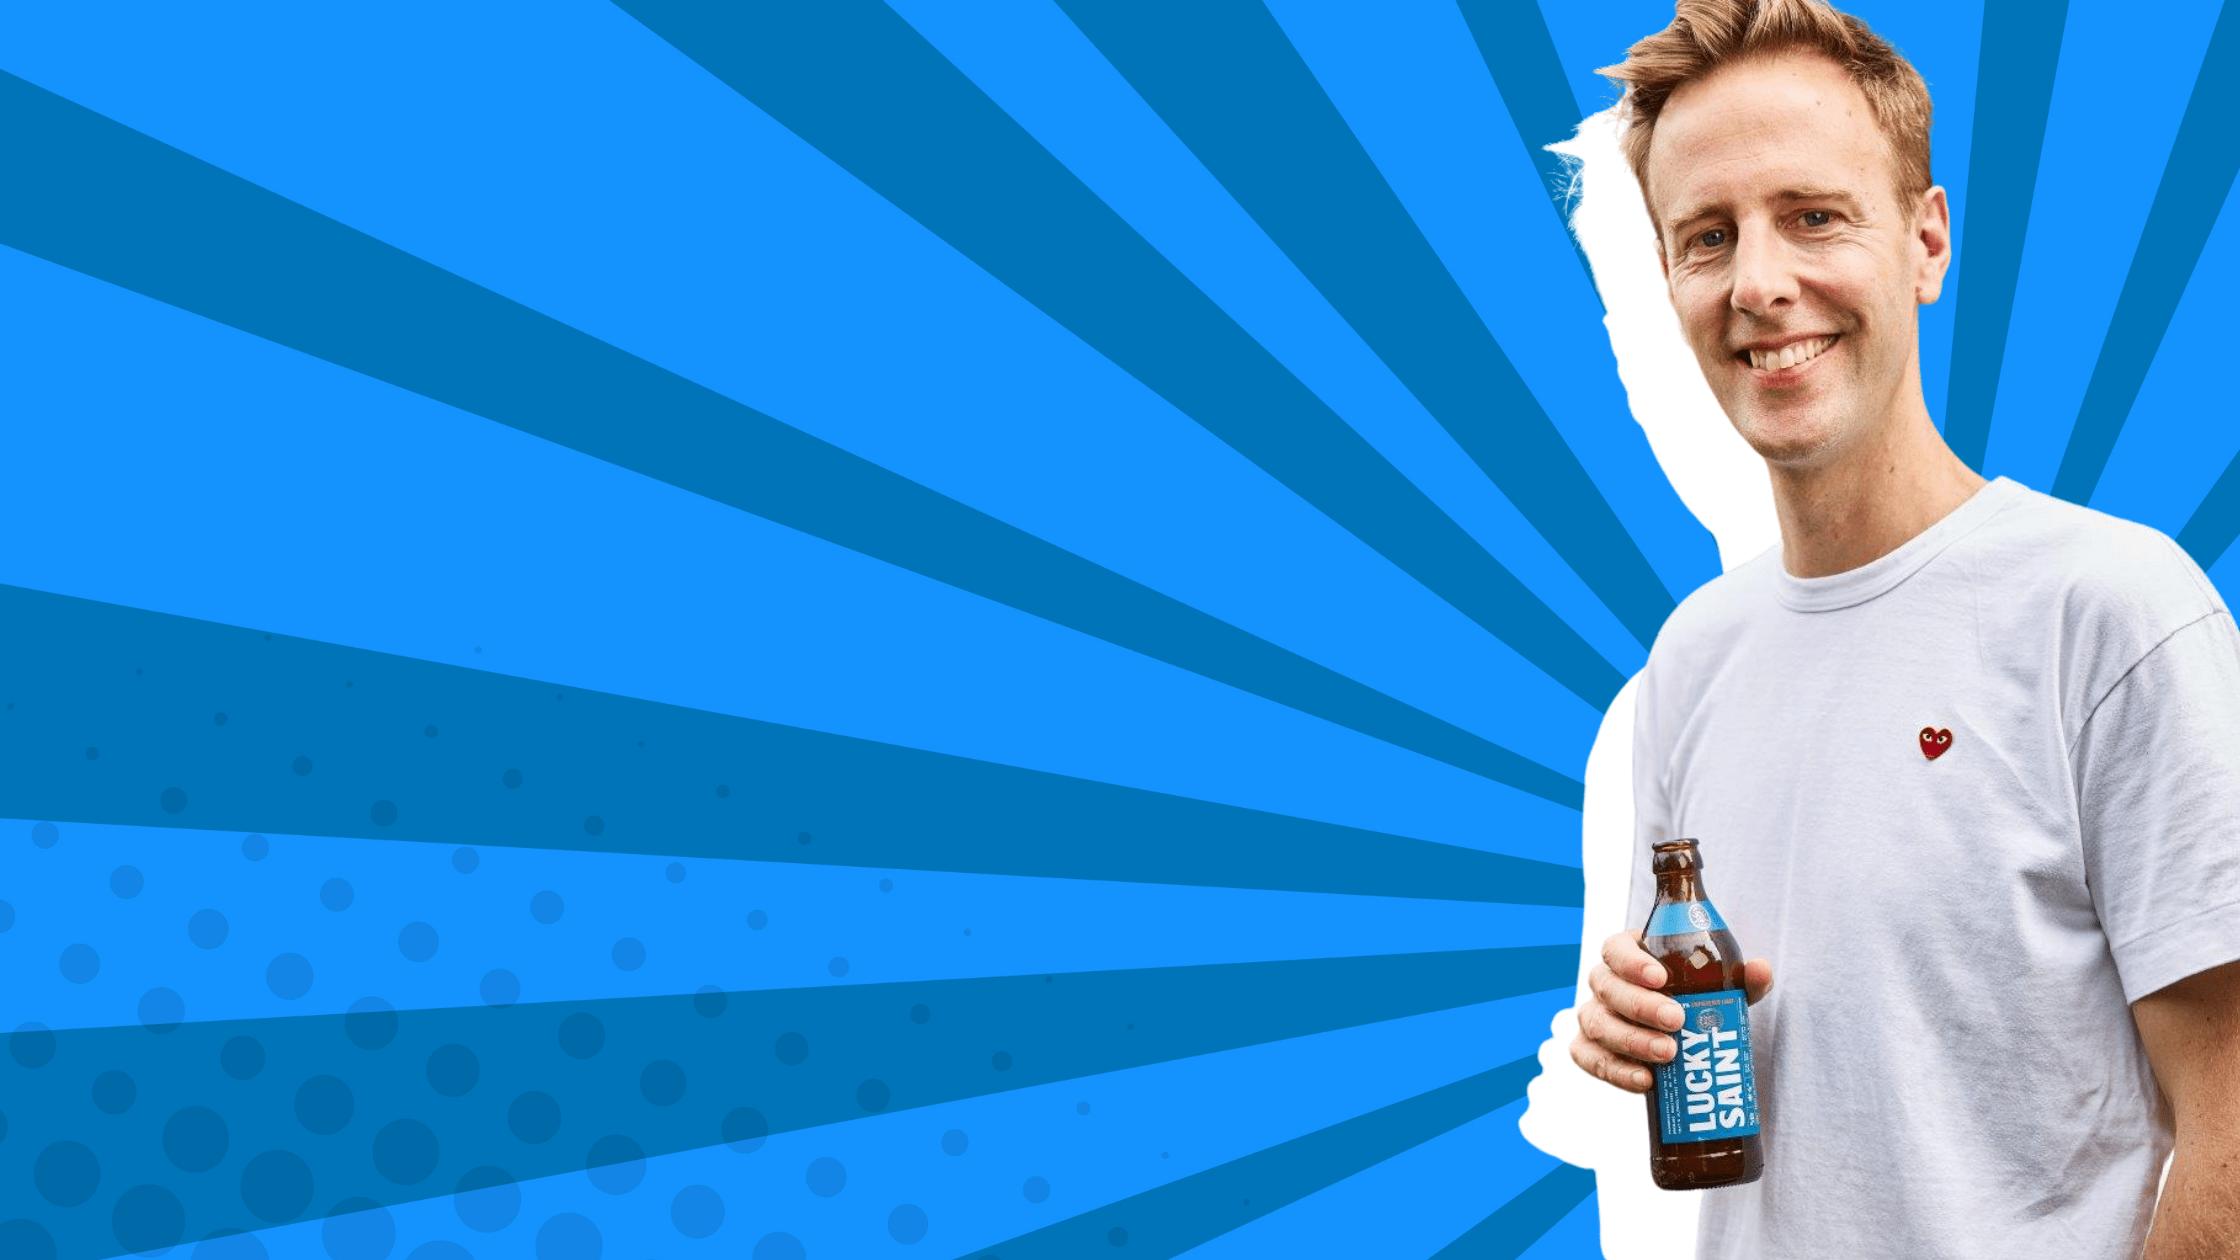 Luke Boase: Shaking Up the Beer Industry